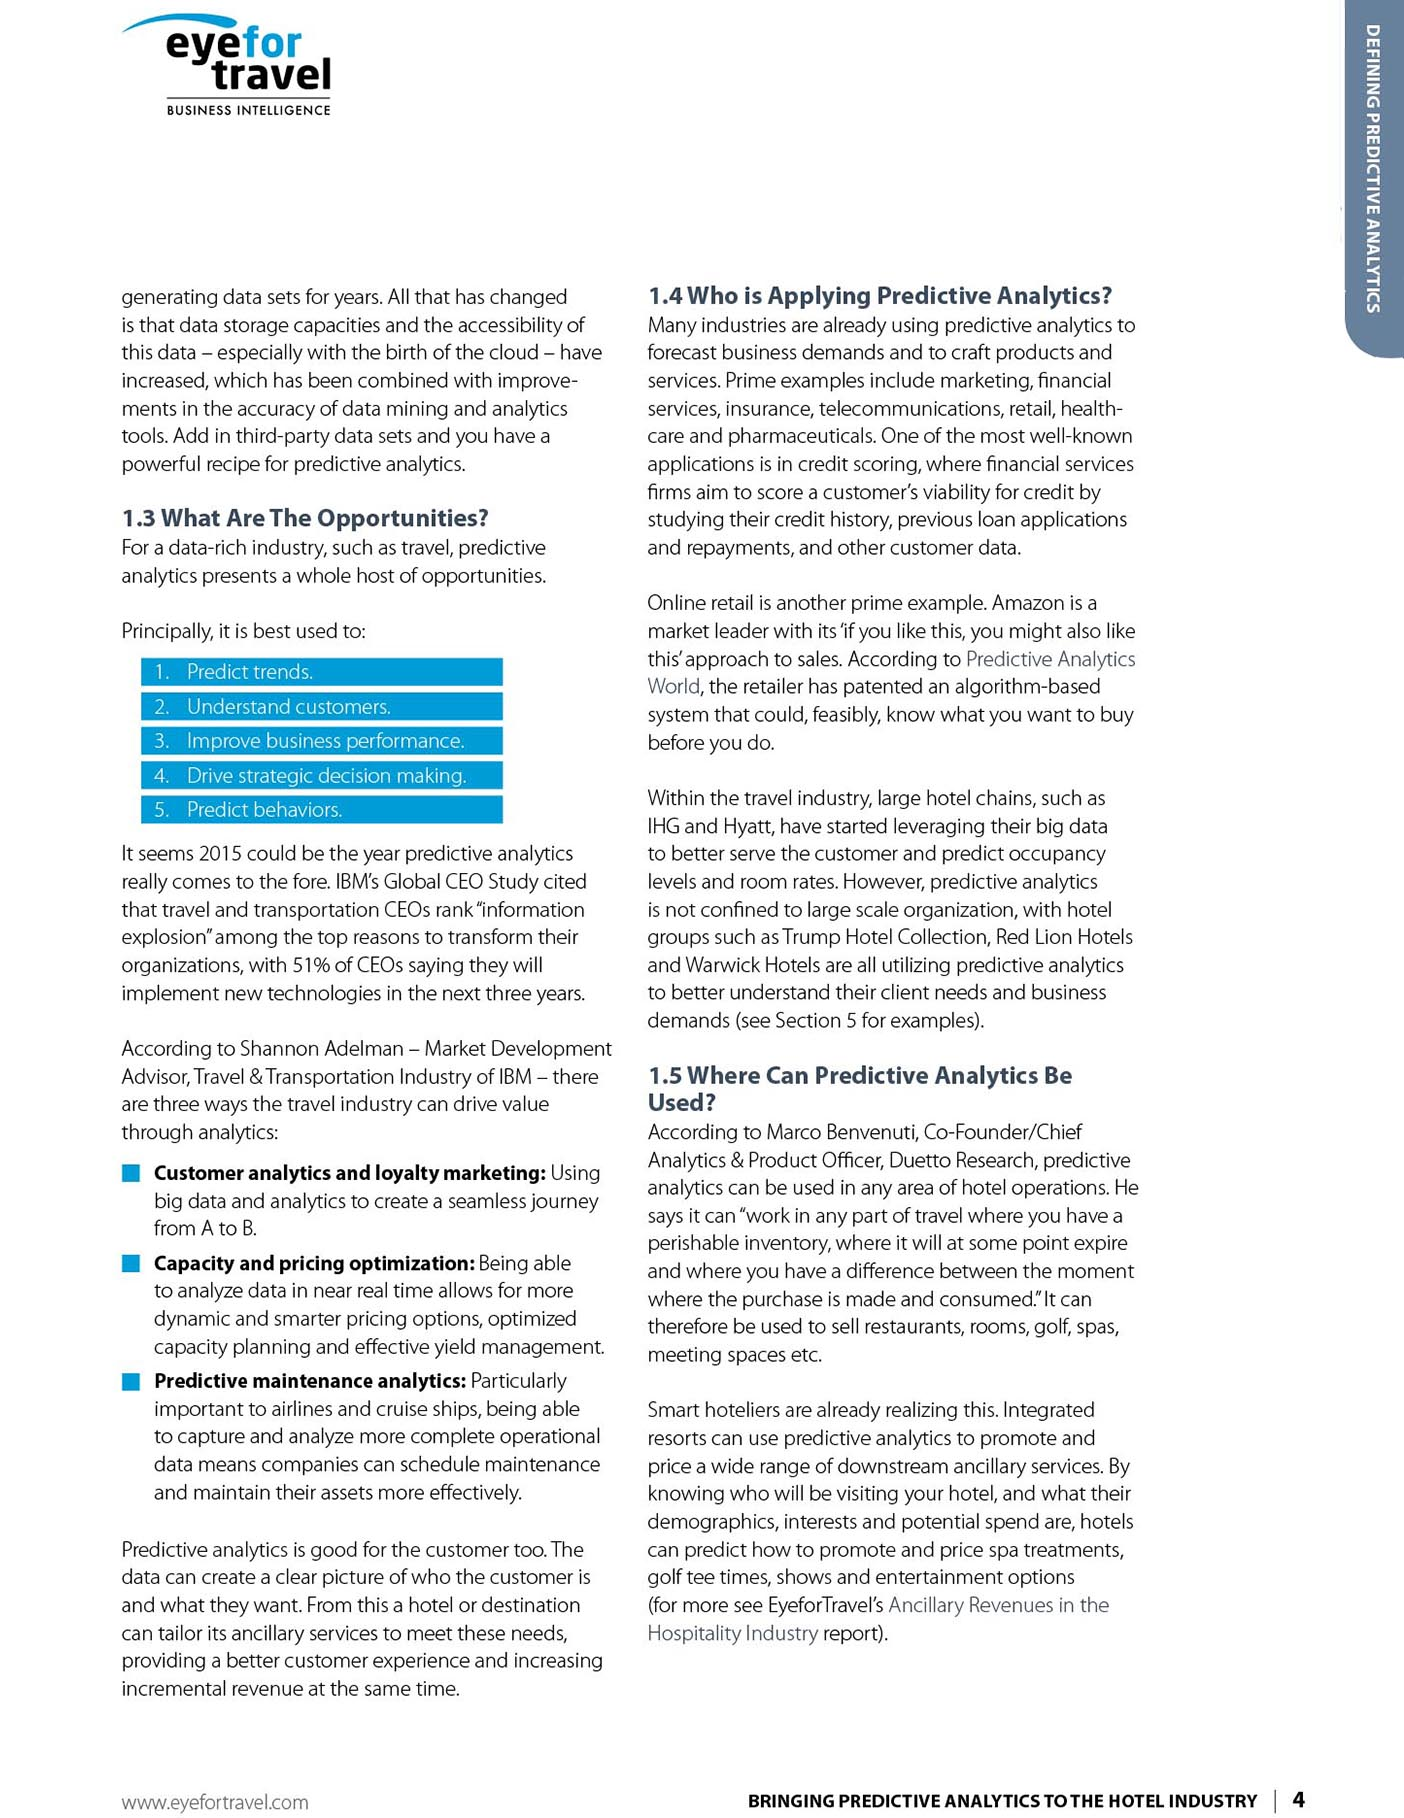 4-Bringing-Predictive-Analytics.jpg